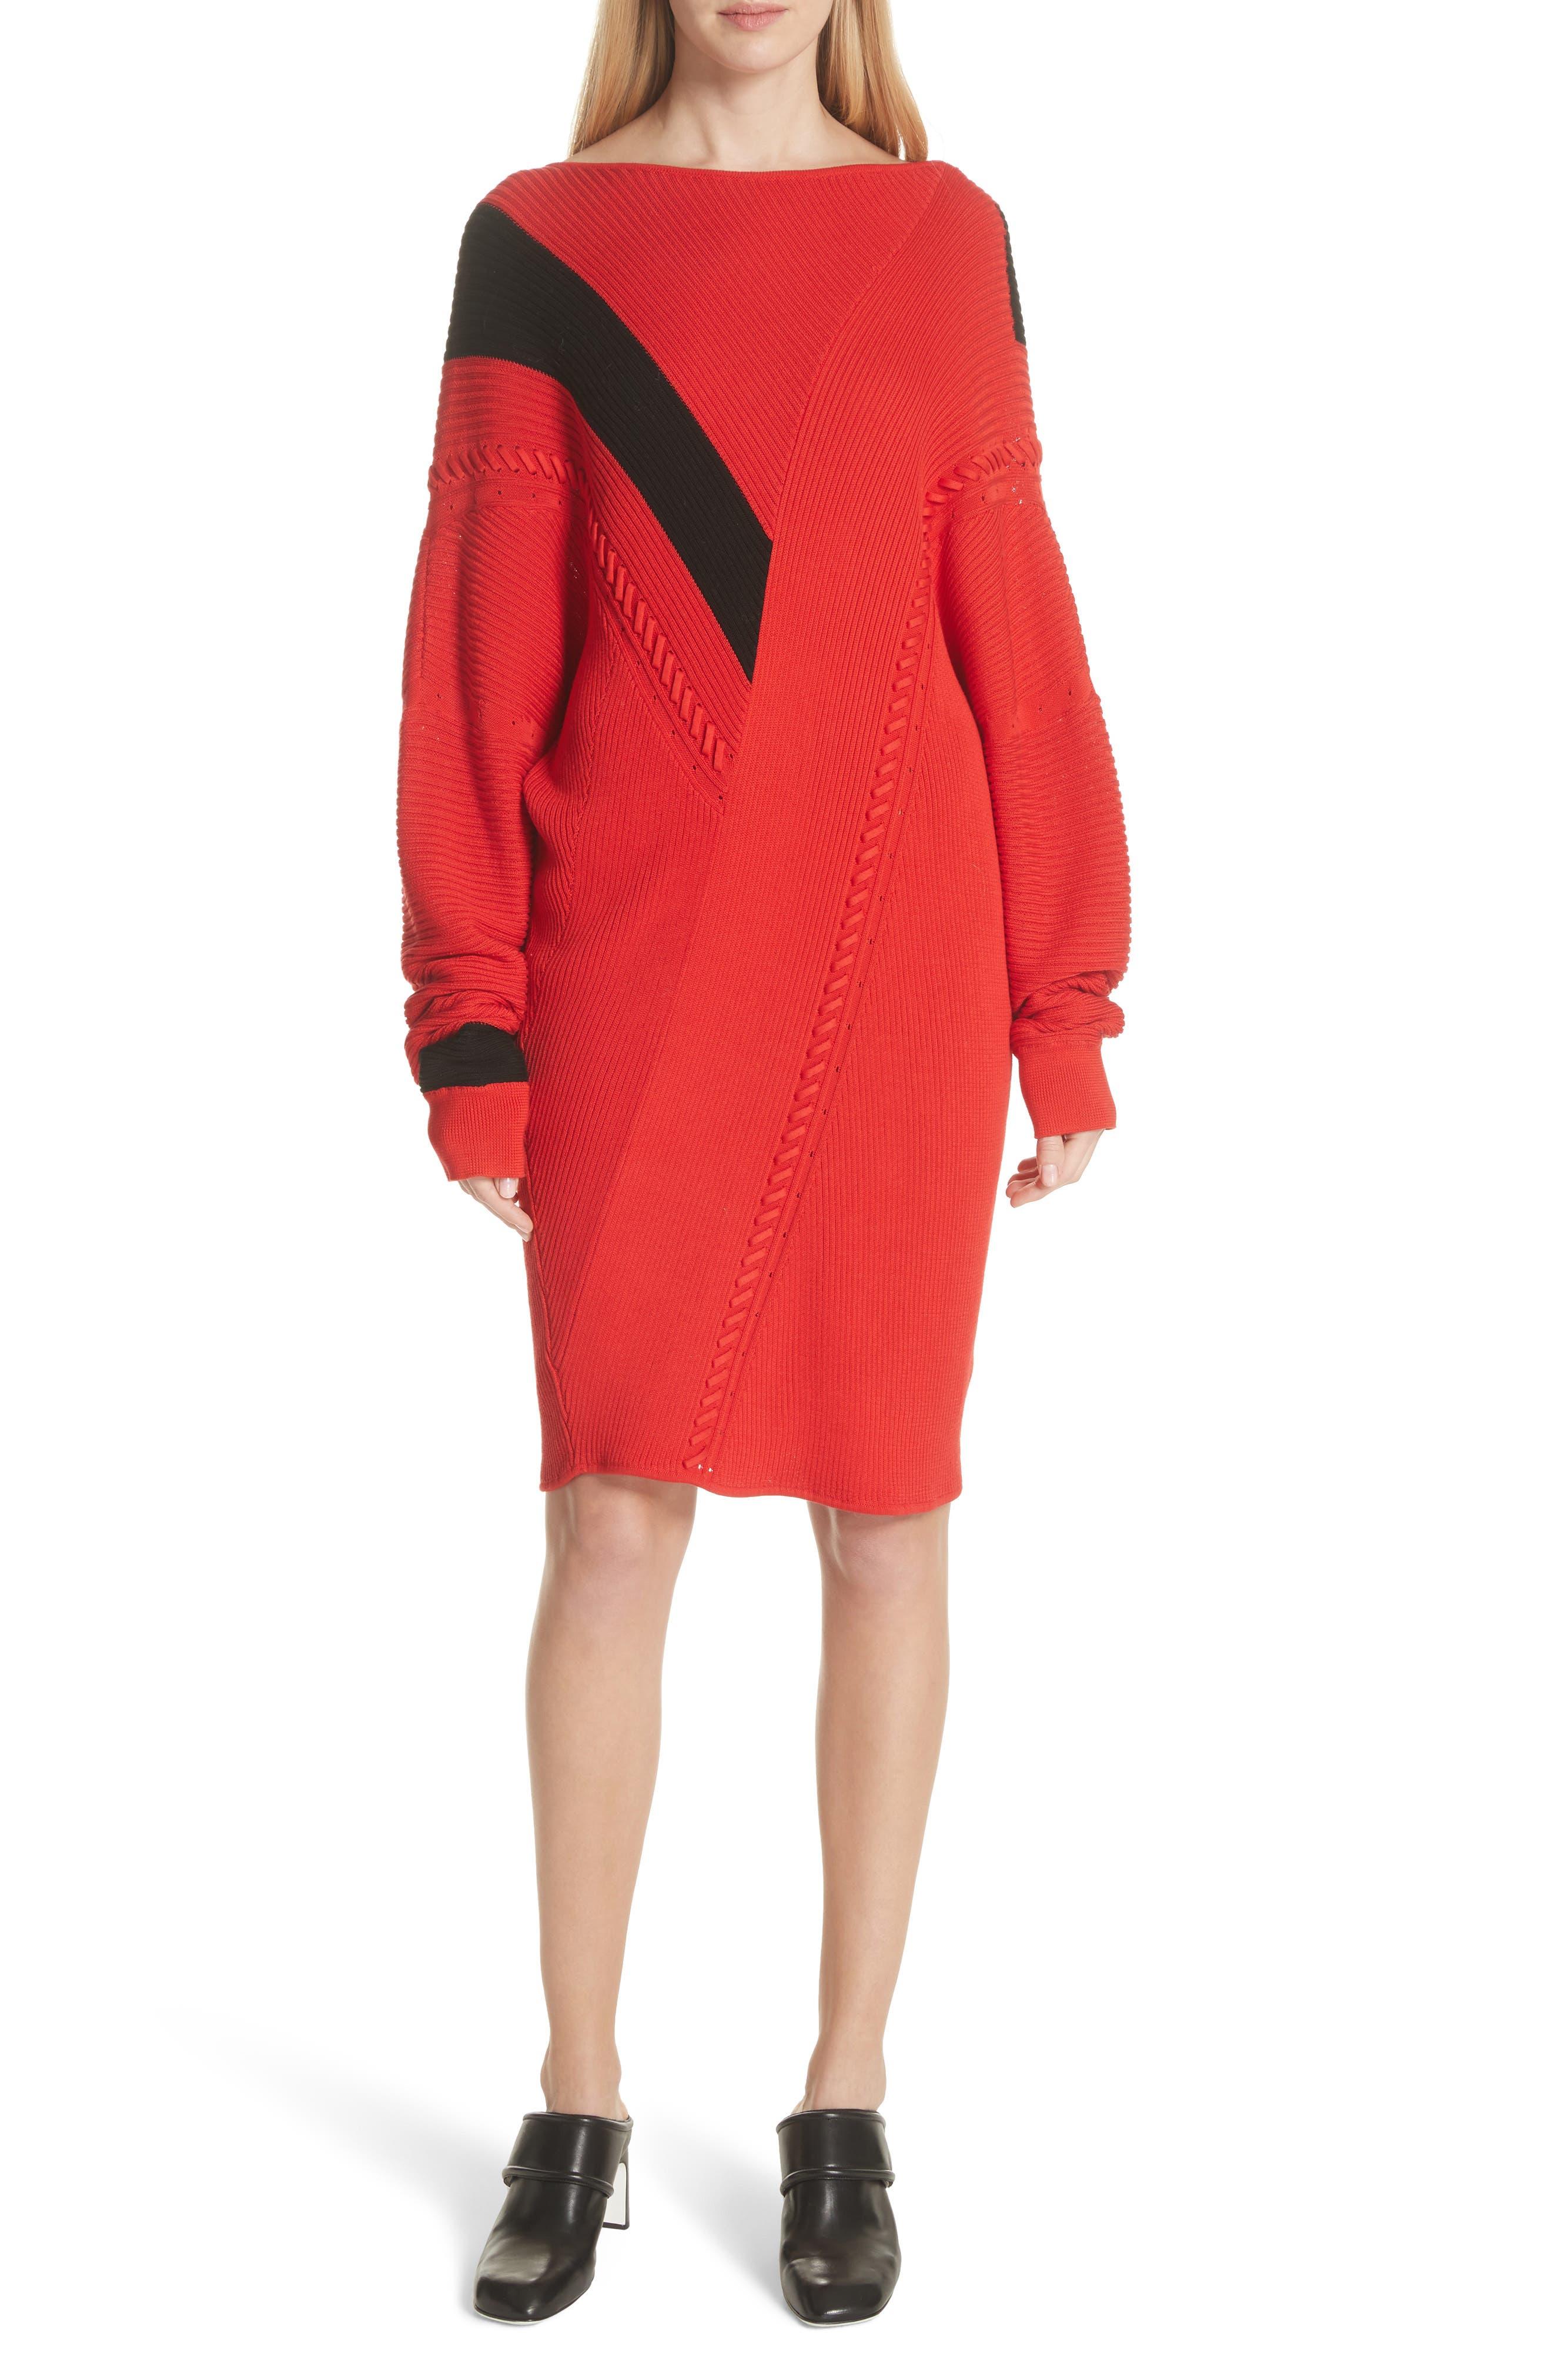 Cricket Reversible Sweater Dress,                         Main,                         color, 600